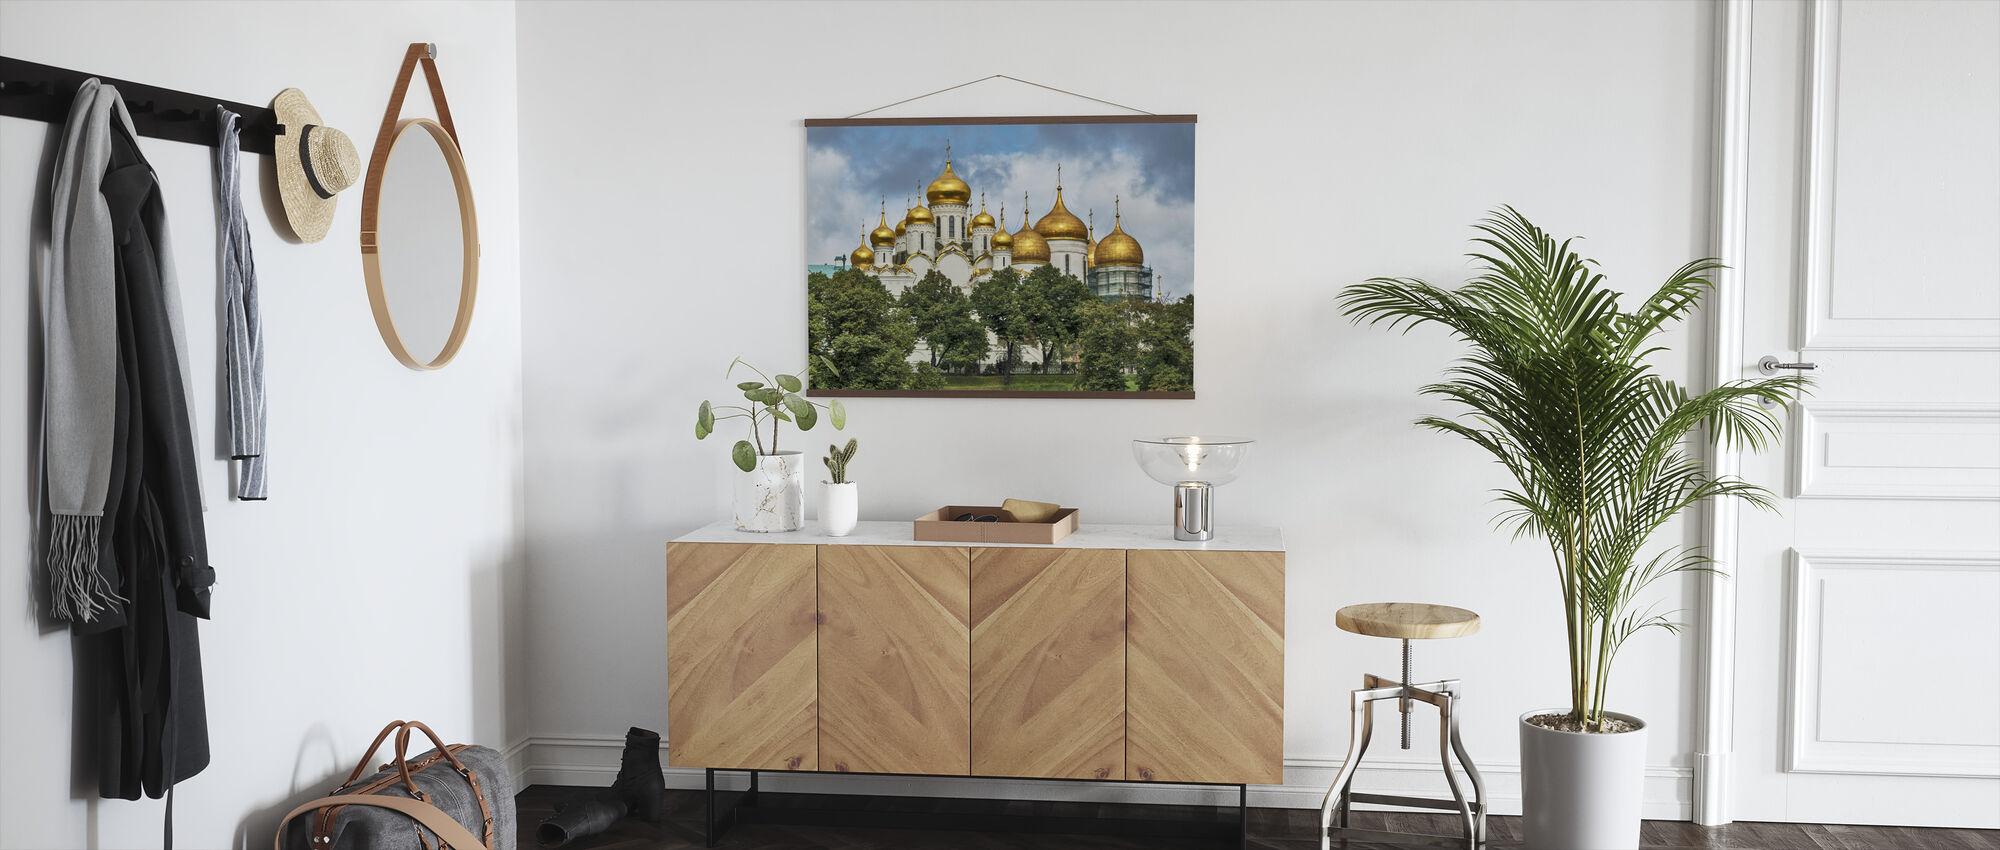 The Kremlin Cathedrals - Poster - Hallway